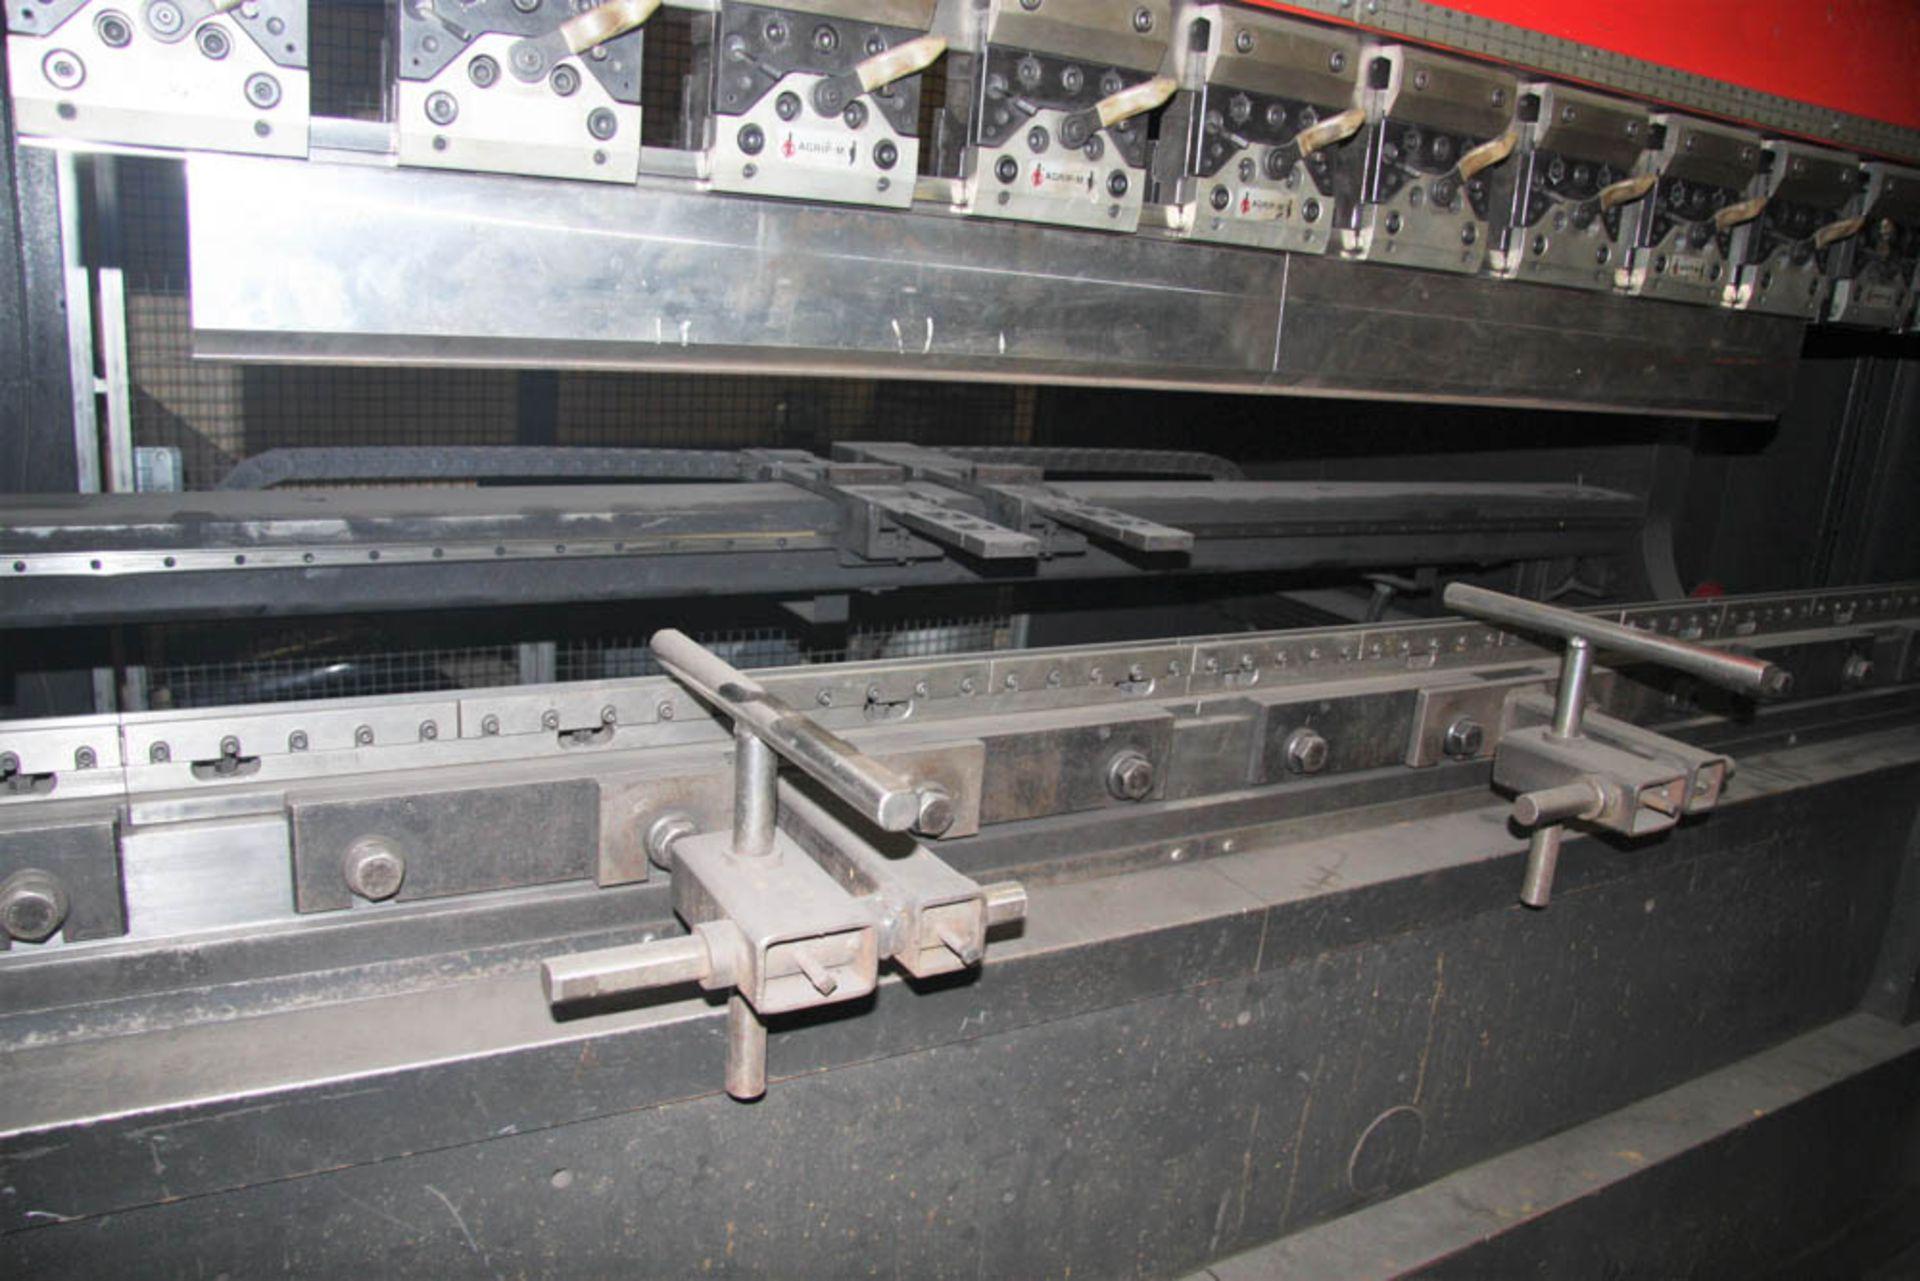 "2015 187 US TON X 122"" AMADA MDL. HG1703 CNC PRESS BRAKE, AMNC 3i CONTROL, 122"" MAX BEND LENGTH - Image 5 of 14"